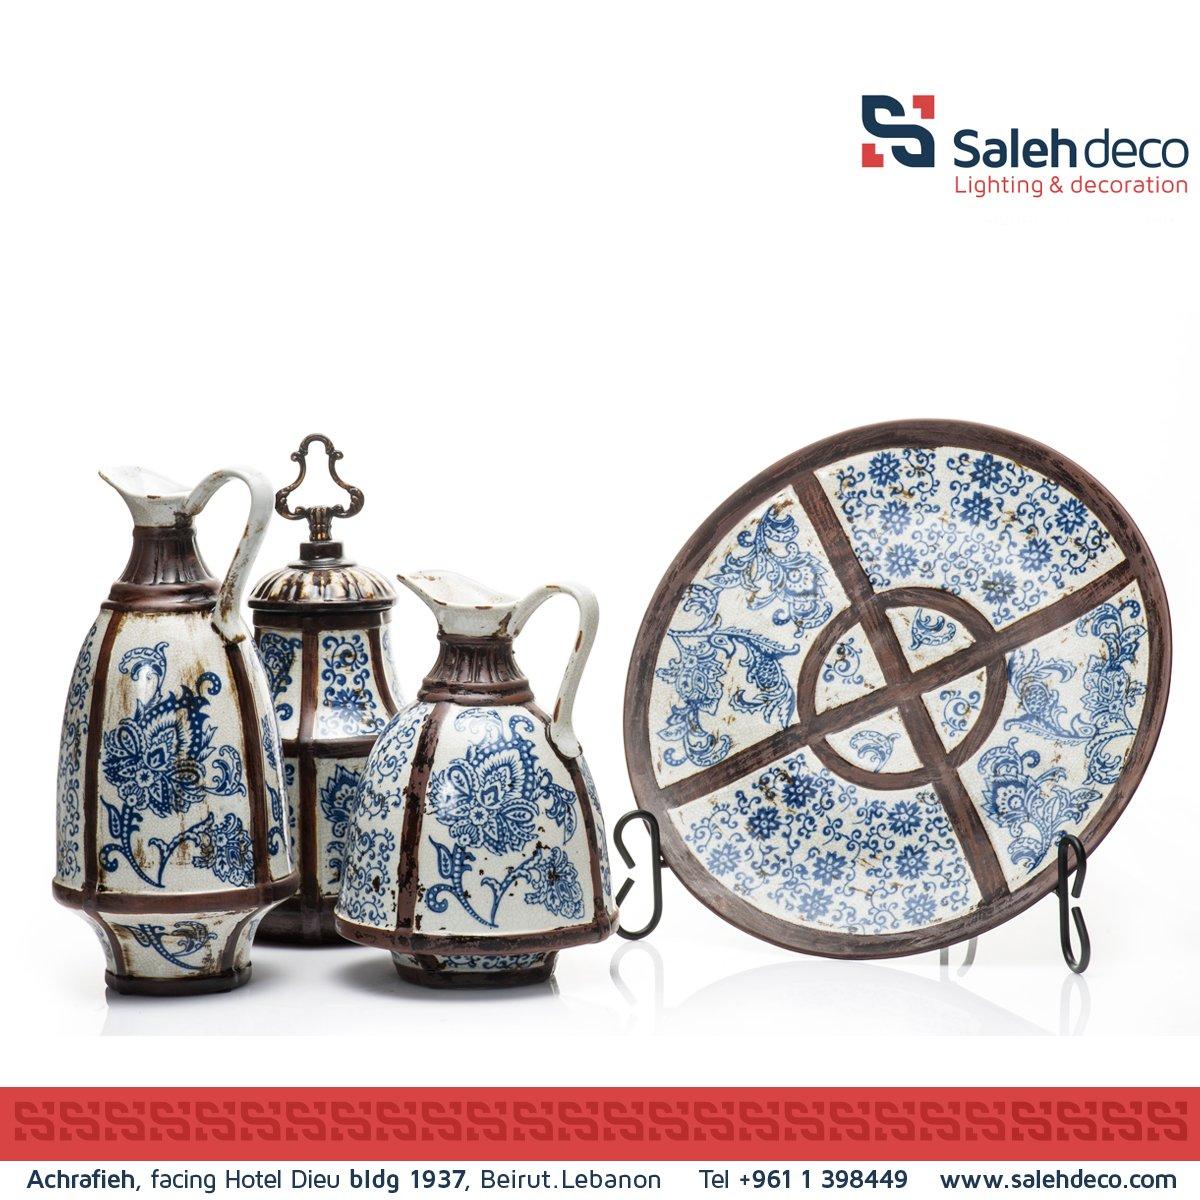 #Beautiful set of #blue #Antique #tableware collection designed for your #authentic house. #design #art #salehdeco https://t.co/GEwQS9jj4C